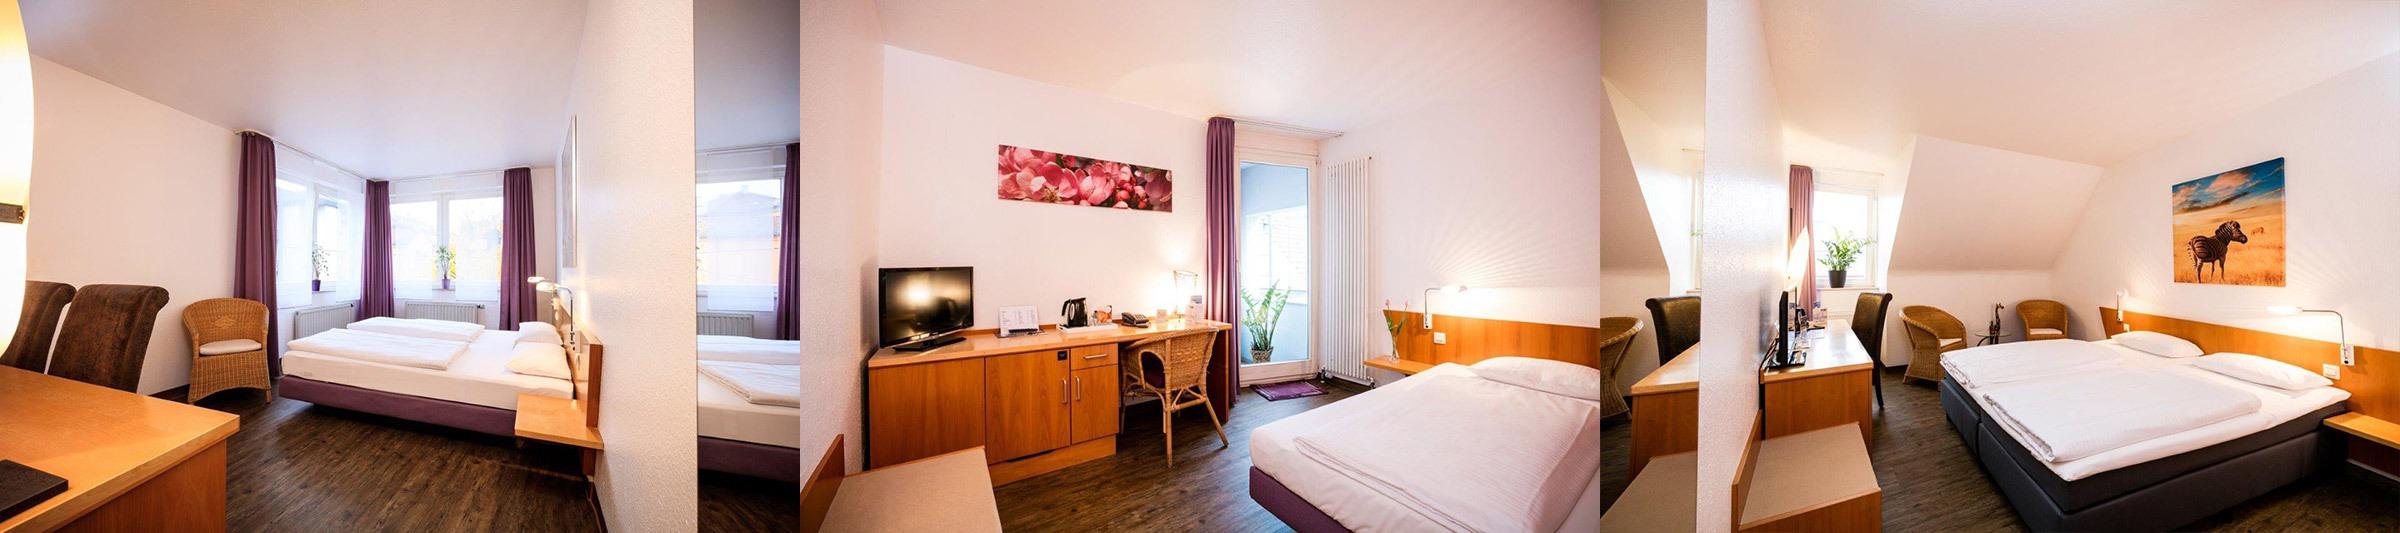 Hogh Hotel Heilbronn